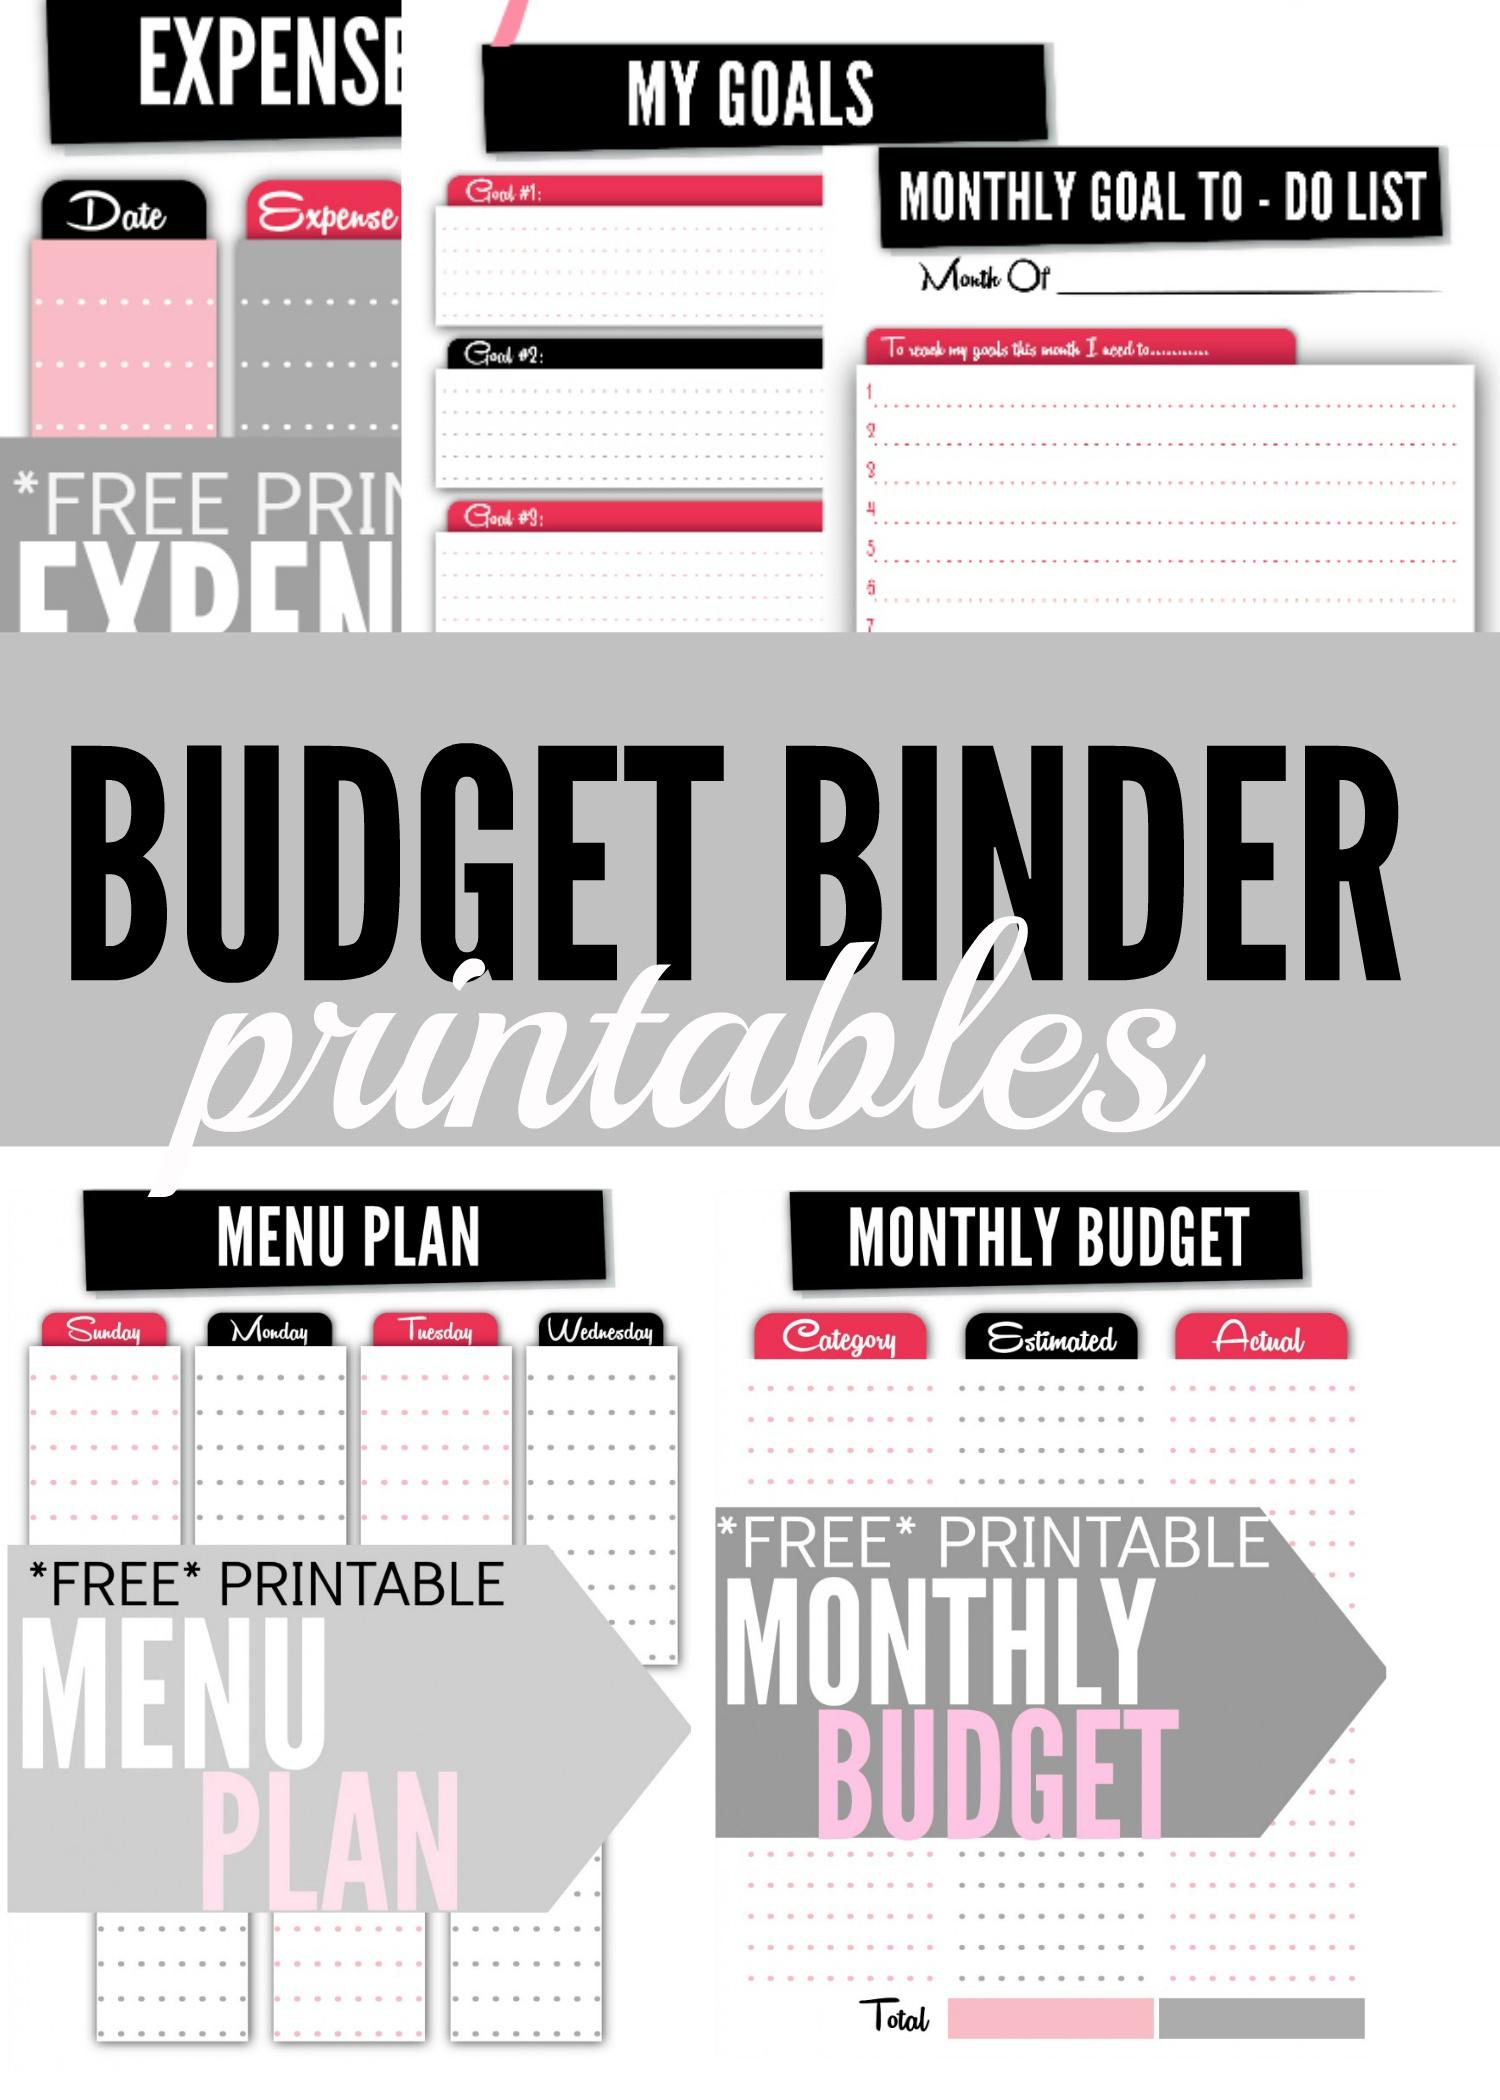 Budget Binder Printables - Single Moms Income - Free Printable Budget Binder